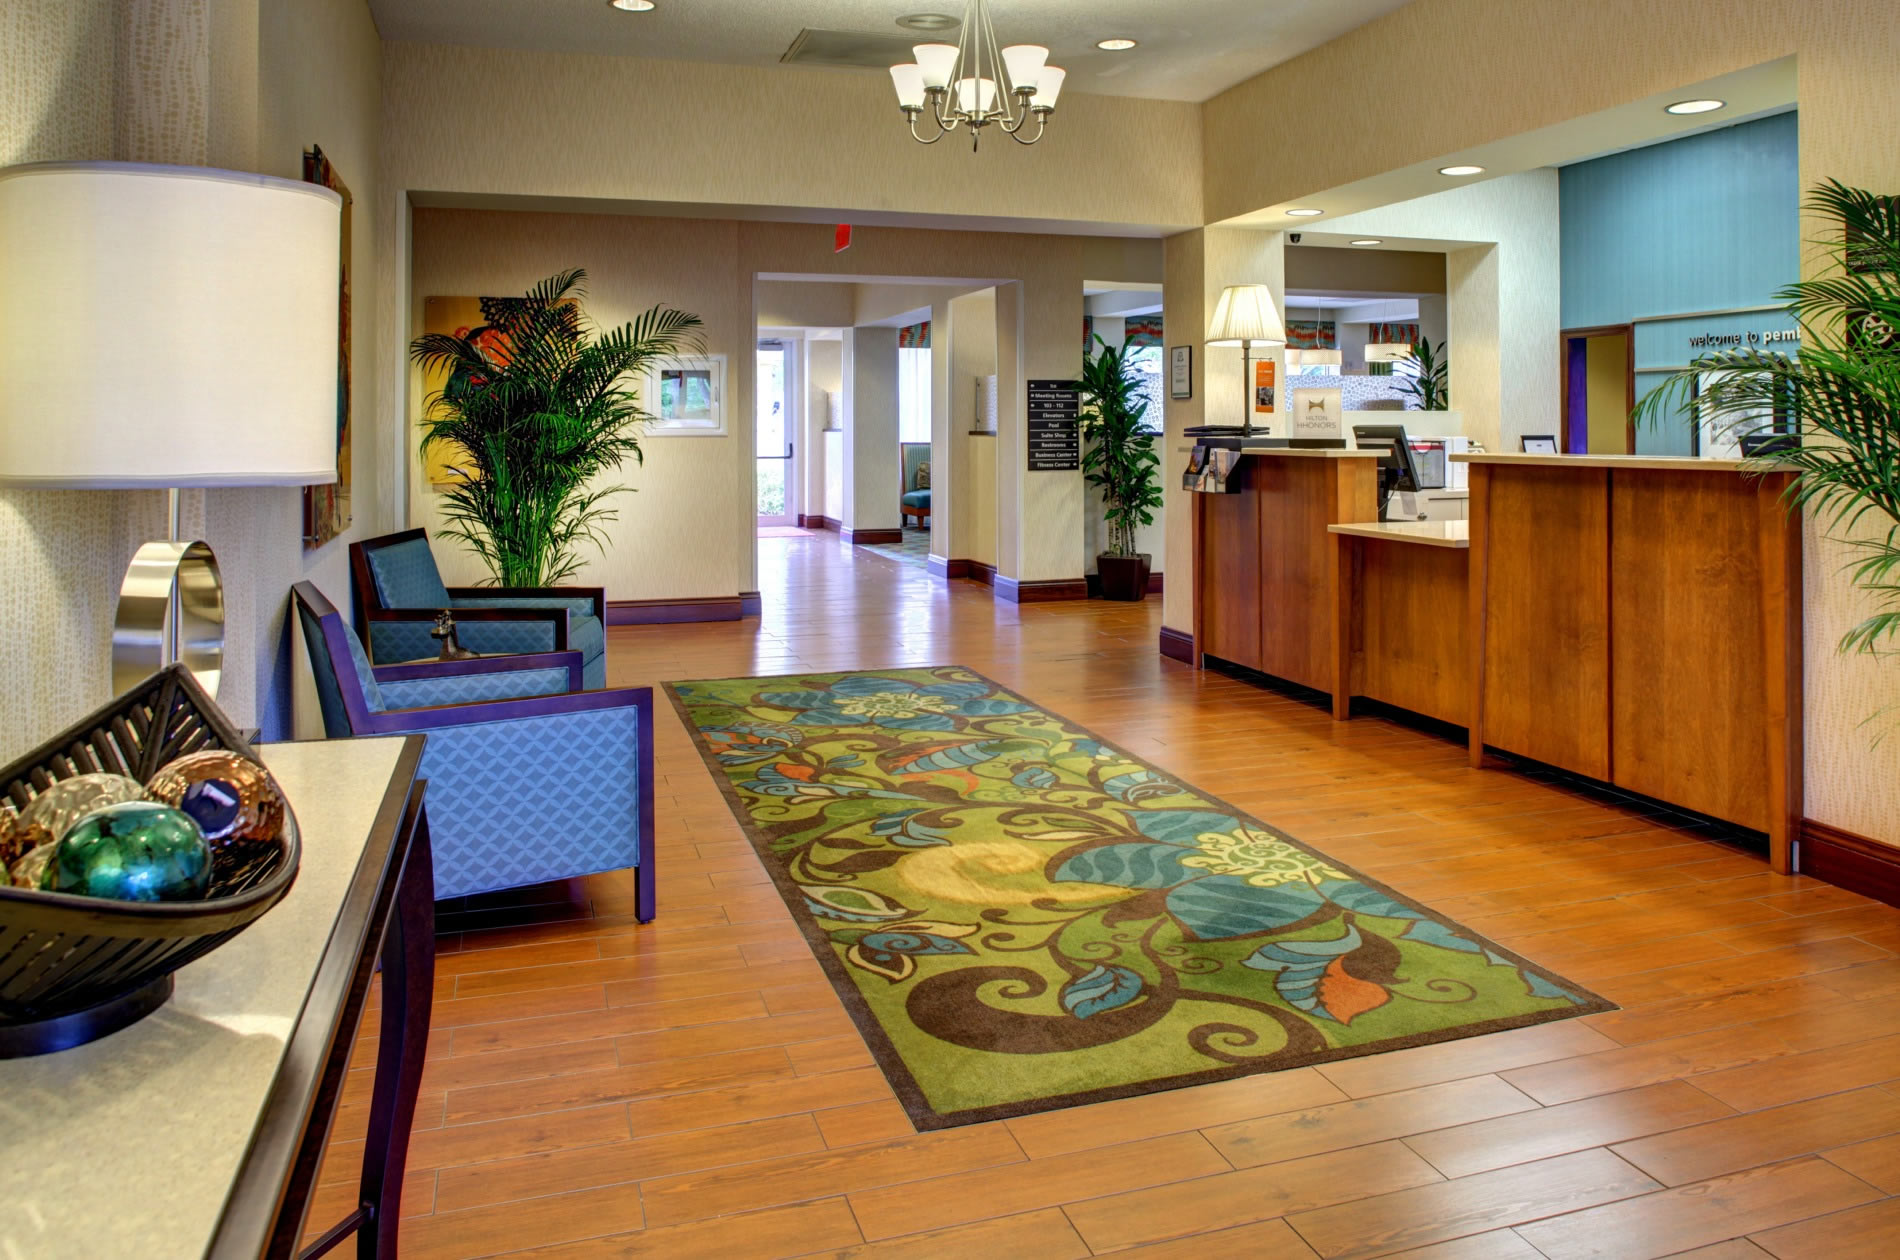 Hampton Inn by Hilton Pembroke Pines - Fort Lauderdale West image 2